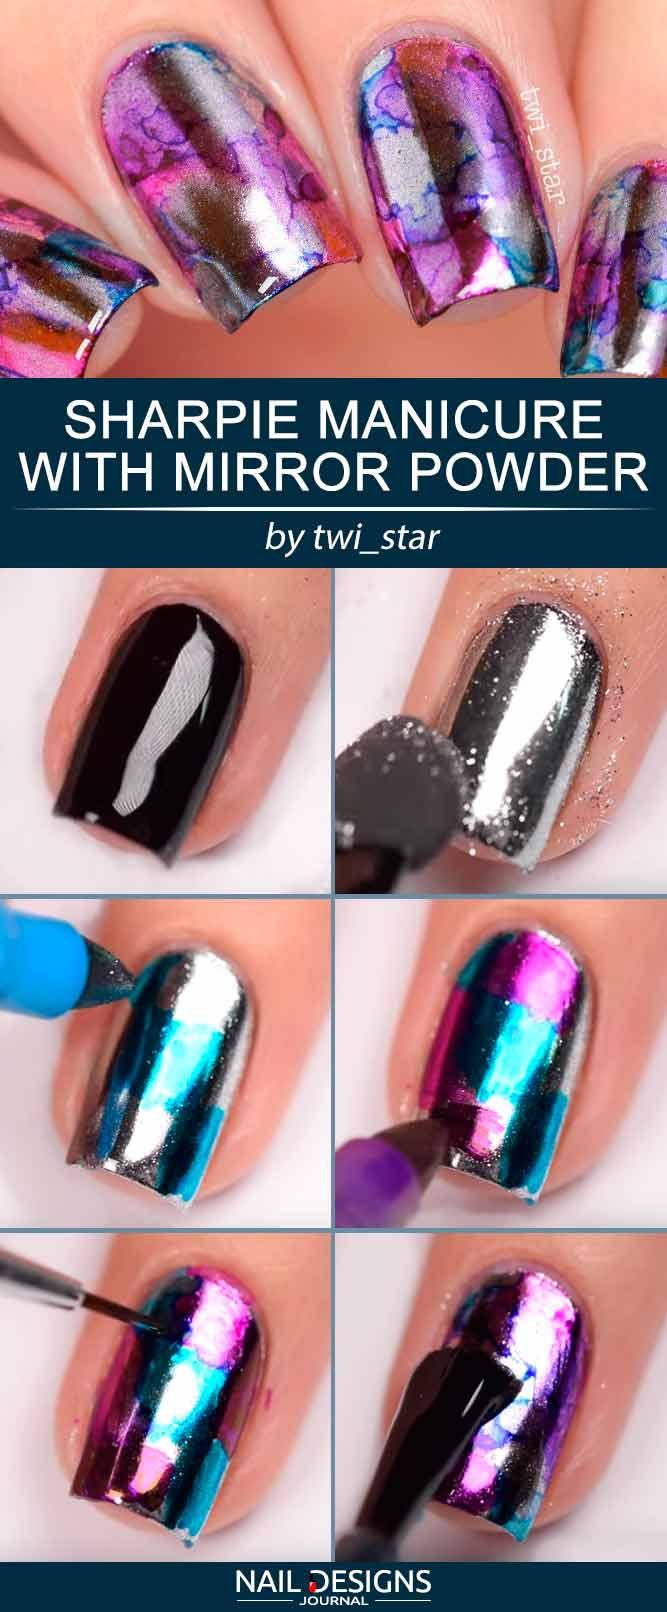 Sharpie Manicure With Mirror Powder #Aquarellnägel #Chromenägel #Mirrornägel